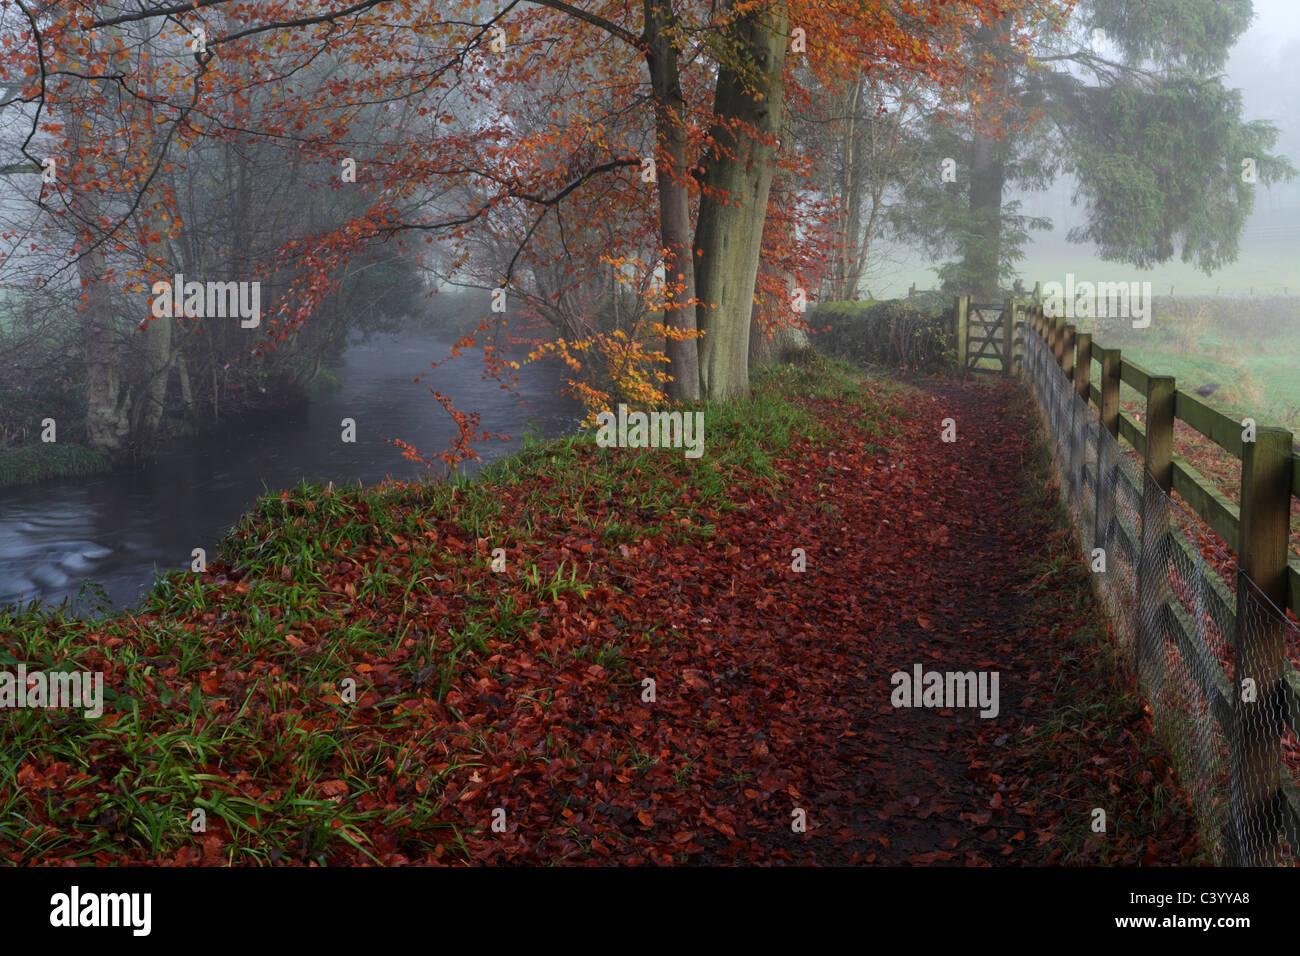 Misty autumn morning walking along the River Washburn near Blubberhouses in Yorkshire, England - Stock Image